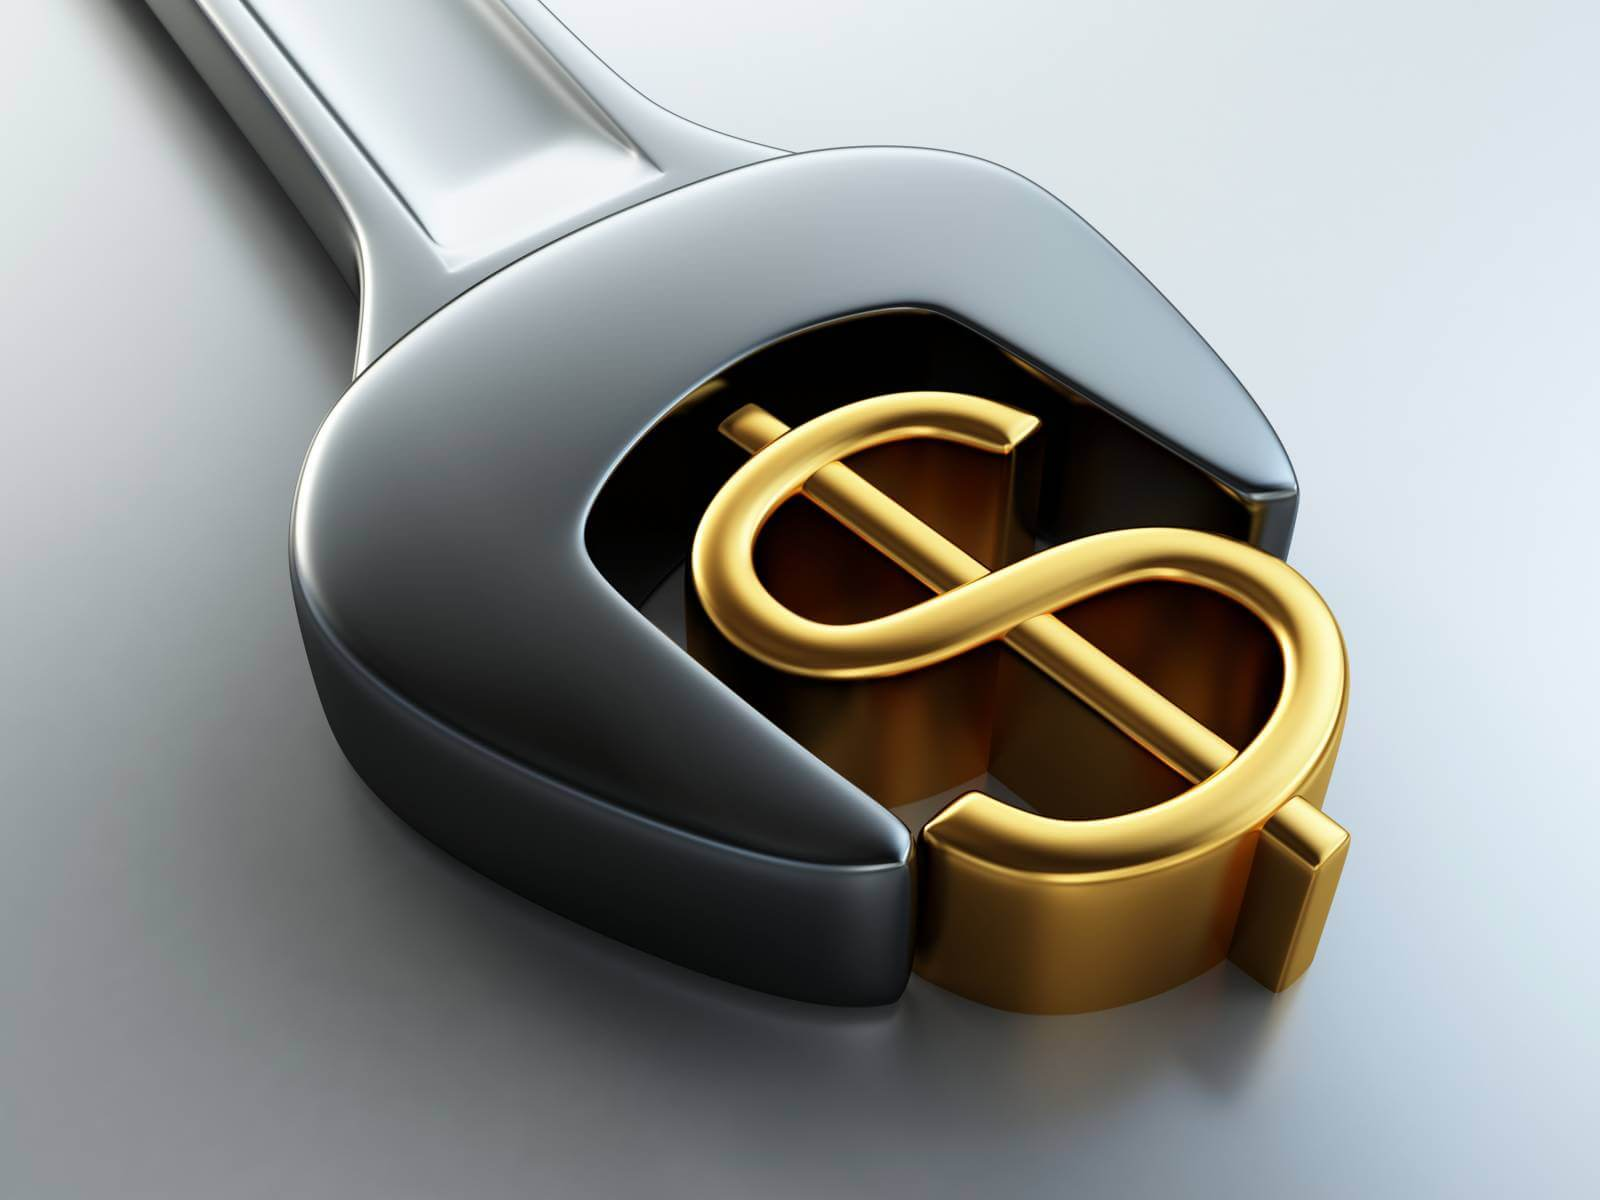 kluch-s-dollarom